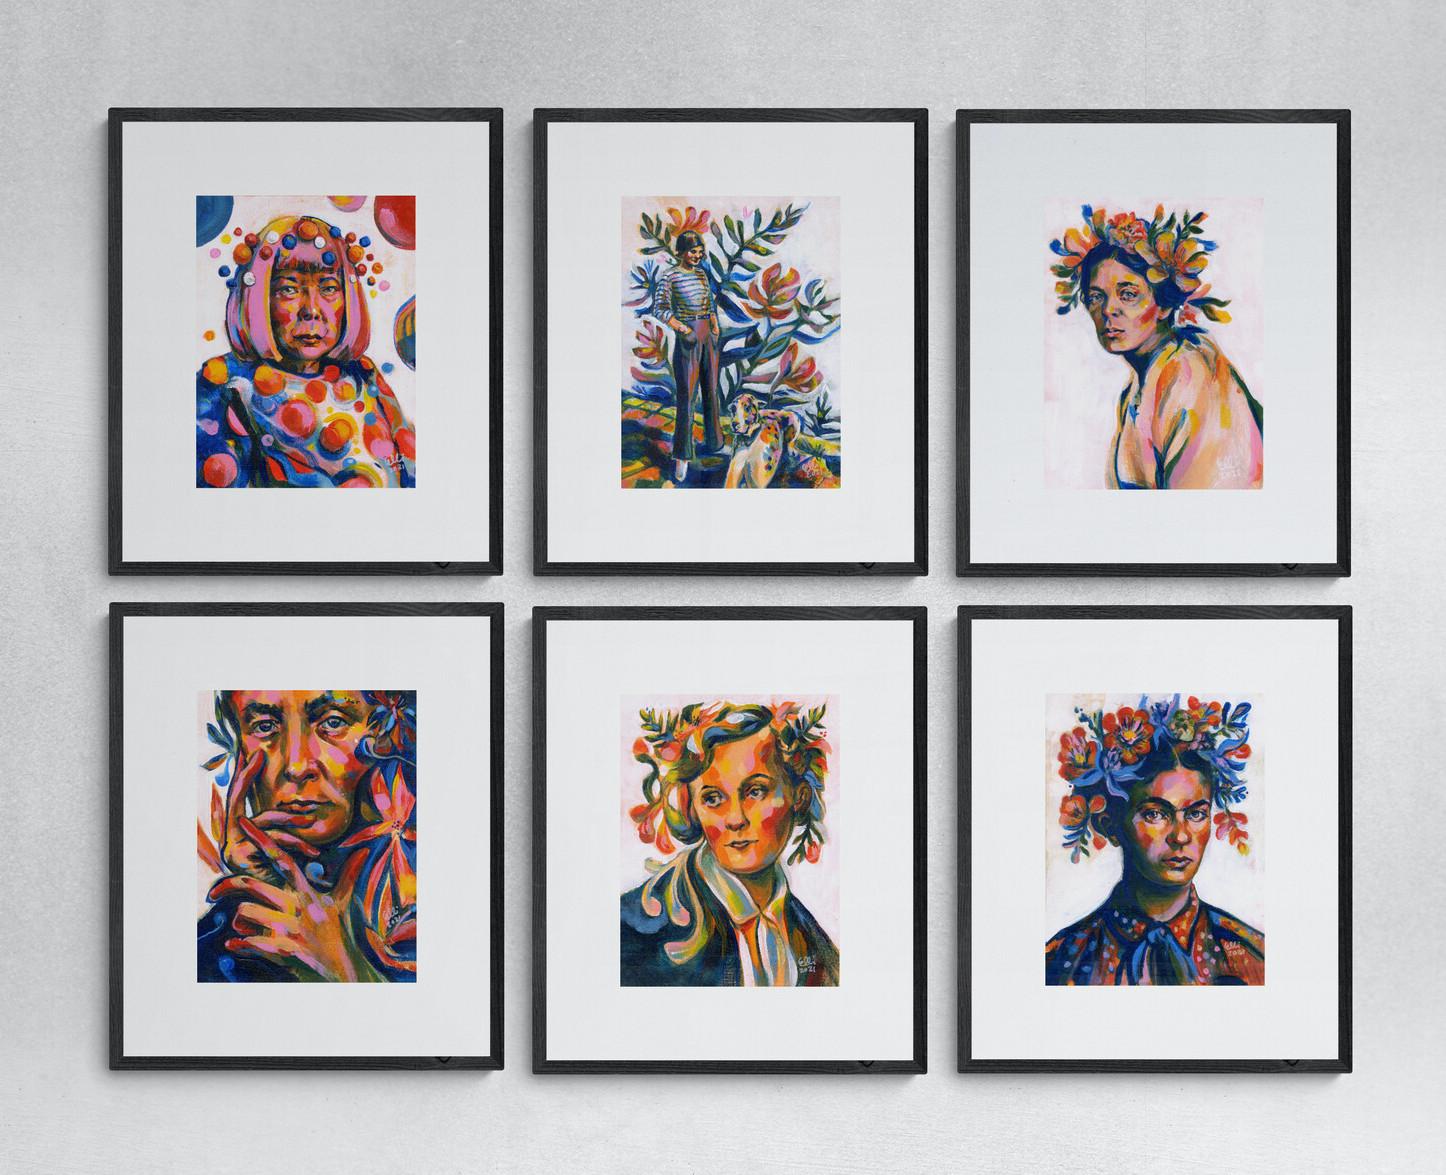 Art Prints Women Artist: Frida Kahlo, Yayoi Kusama, Coco Chanel, Georgia O'Keeffe, Astrid Lindgren, Ellen Thesleff. Taideprintti. Elli Maanpää. 30 x 40 cm 2021